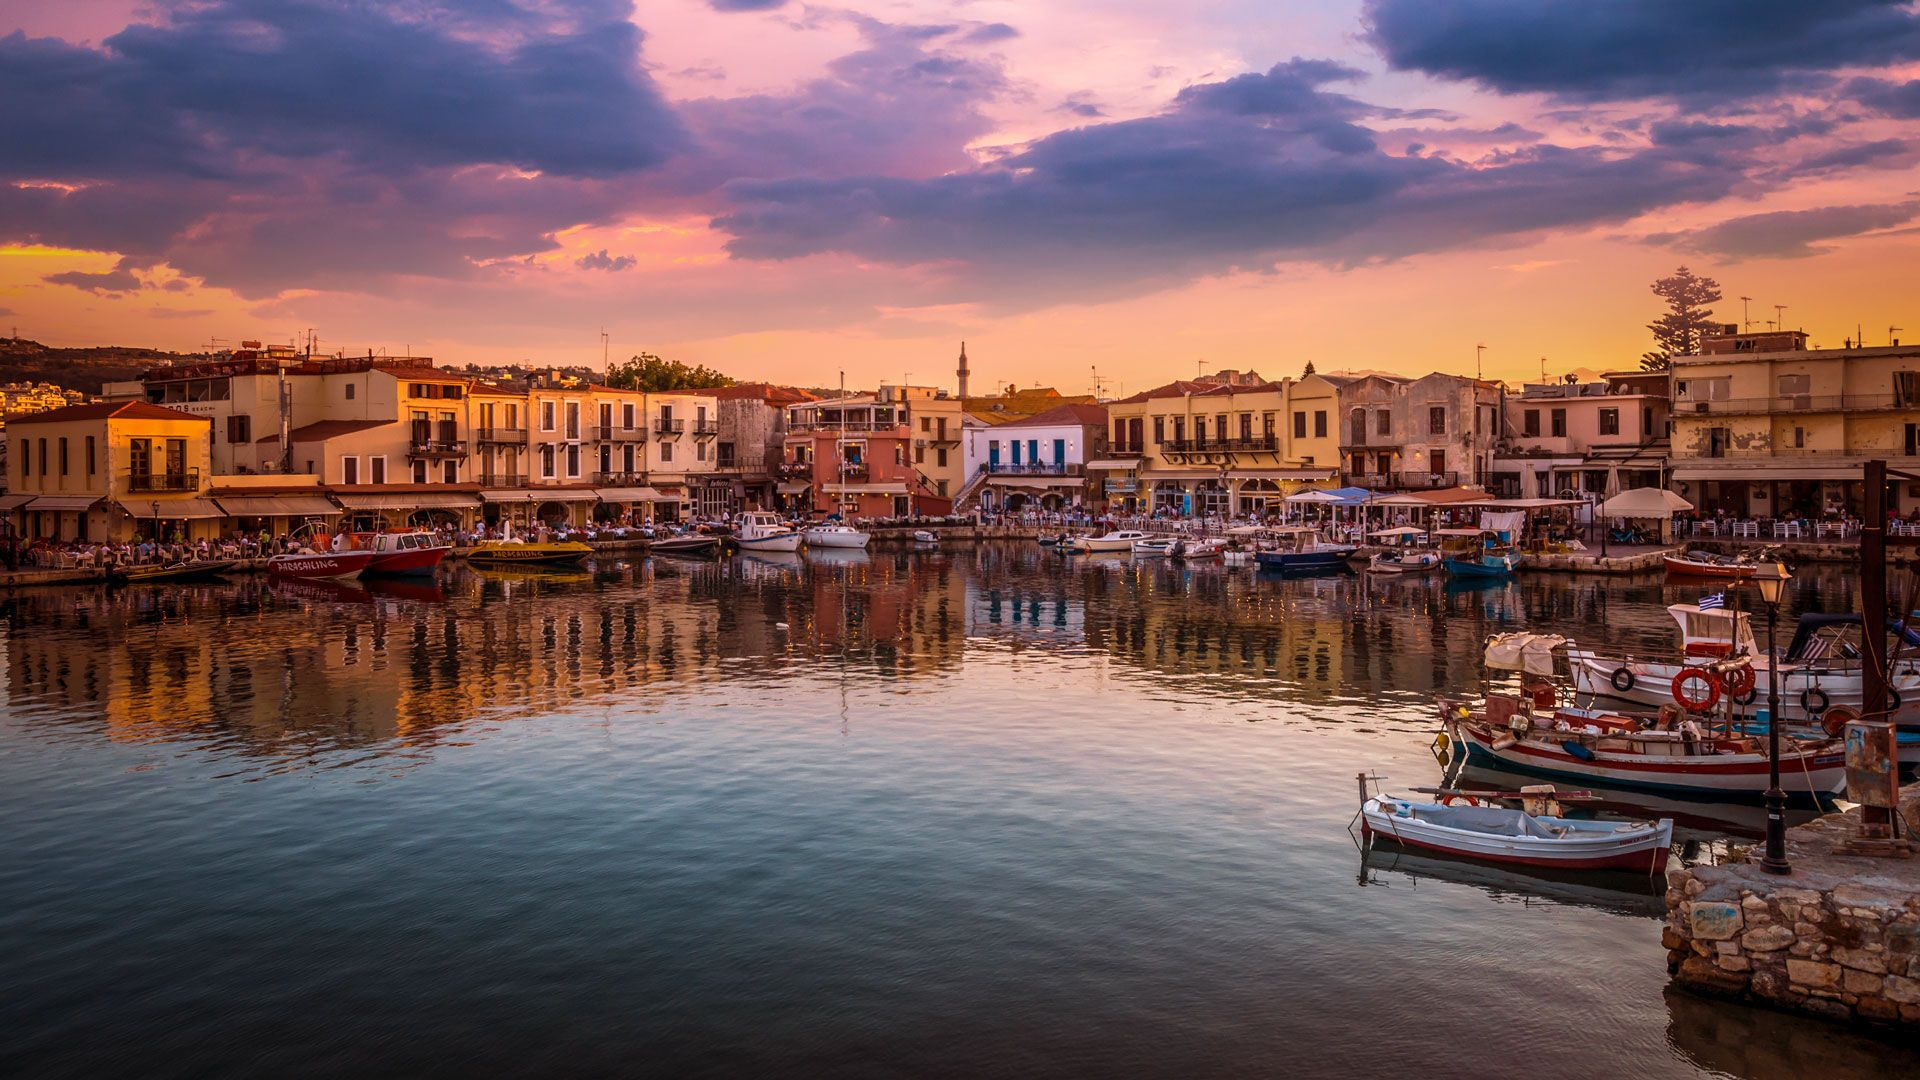 Old Venetian Harbour, Rethymno, Greece